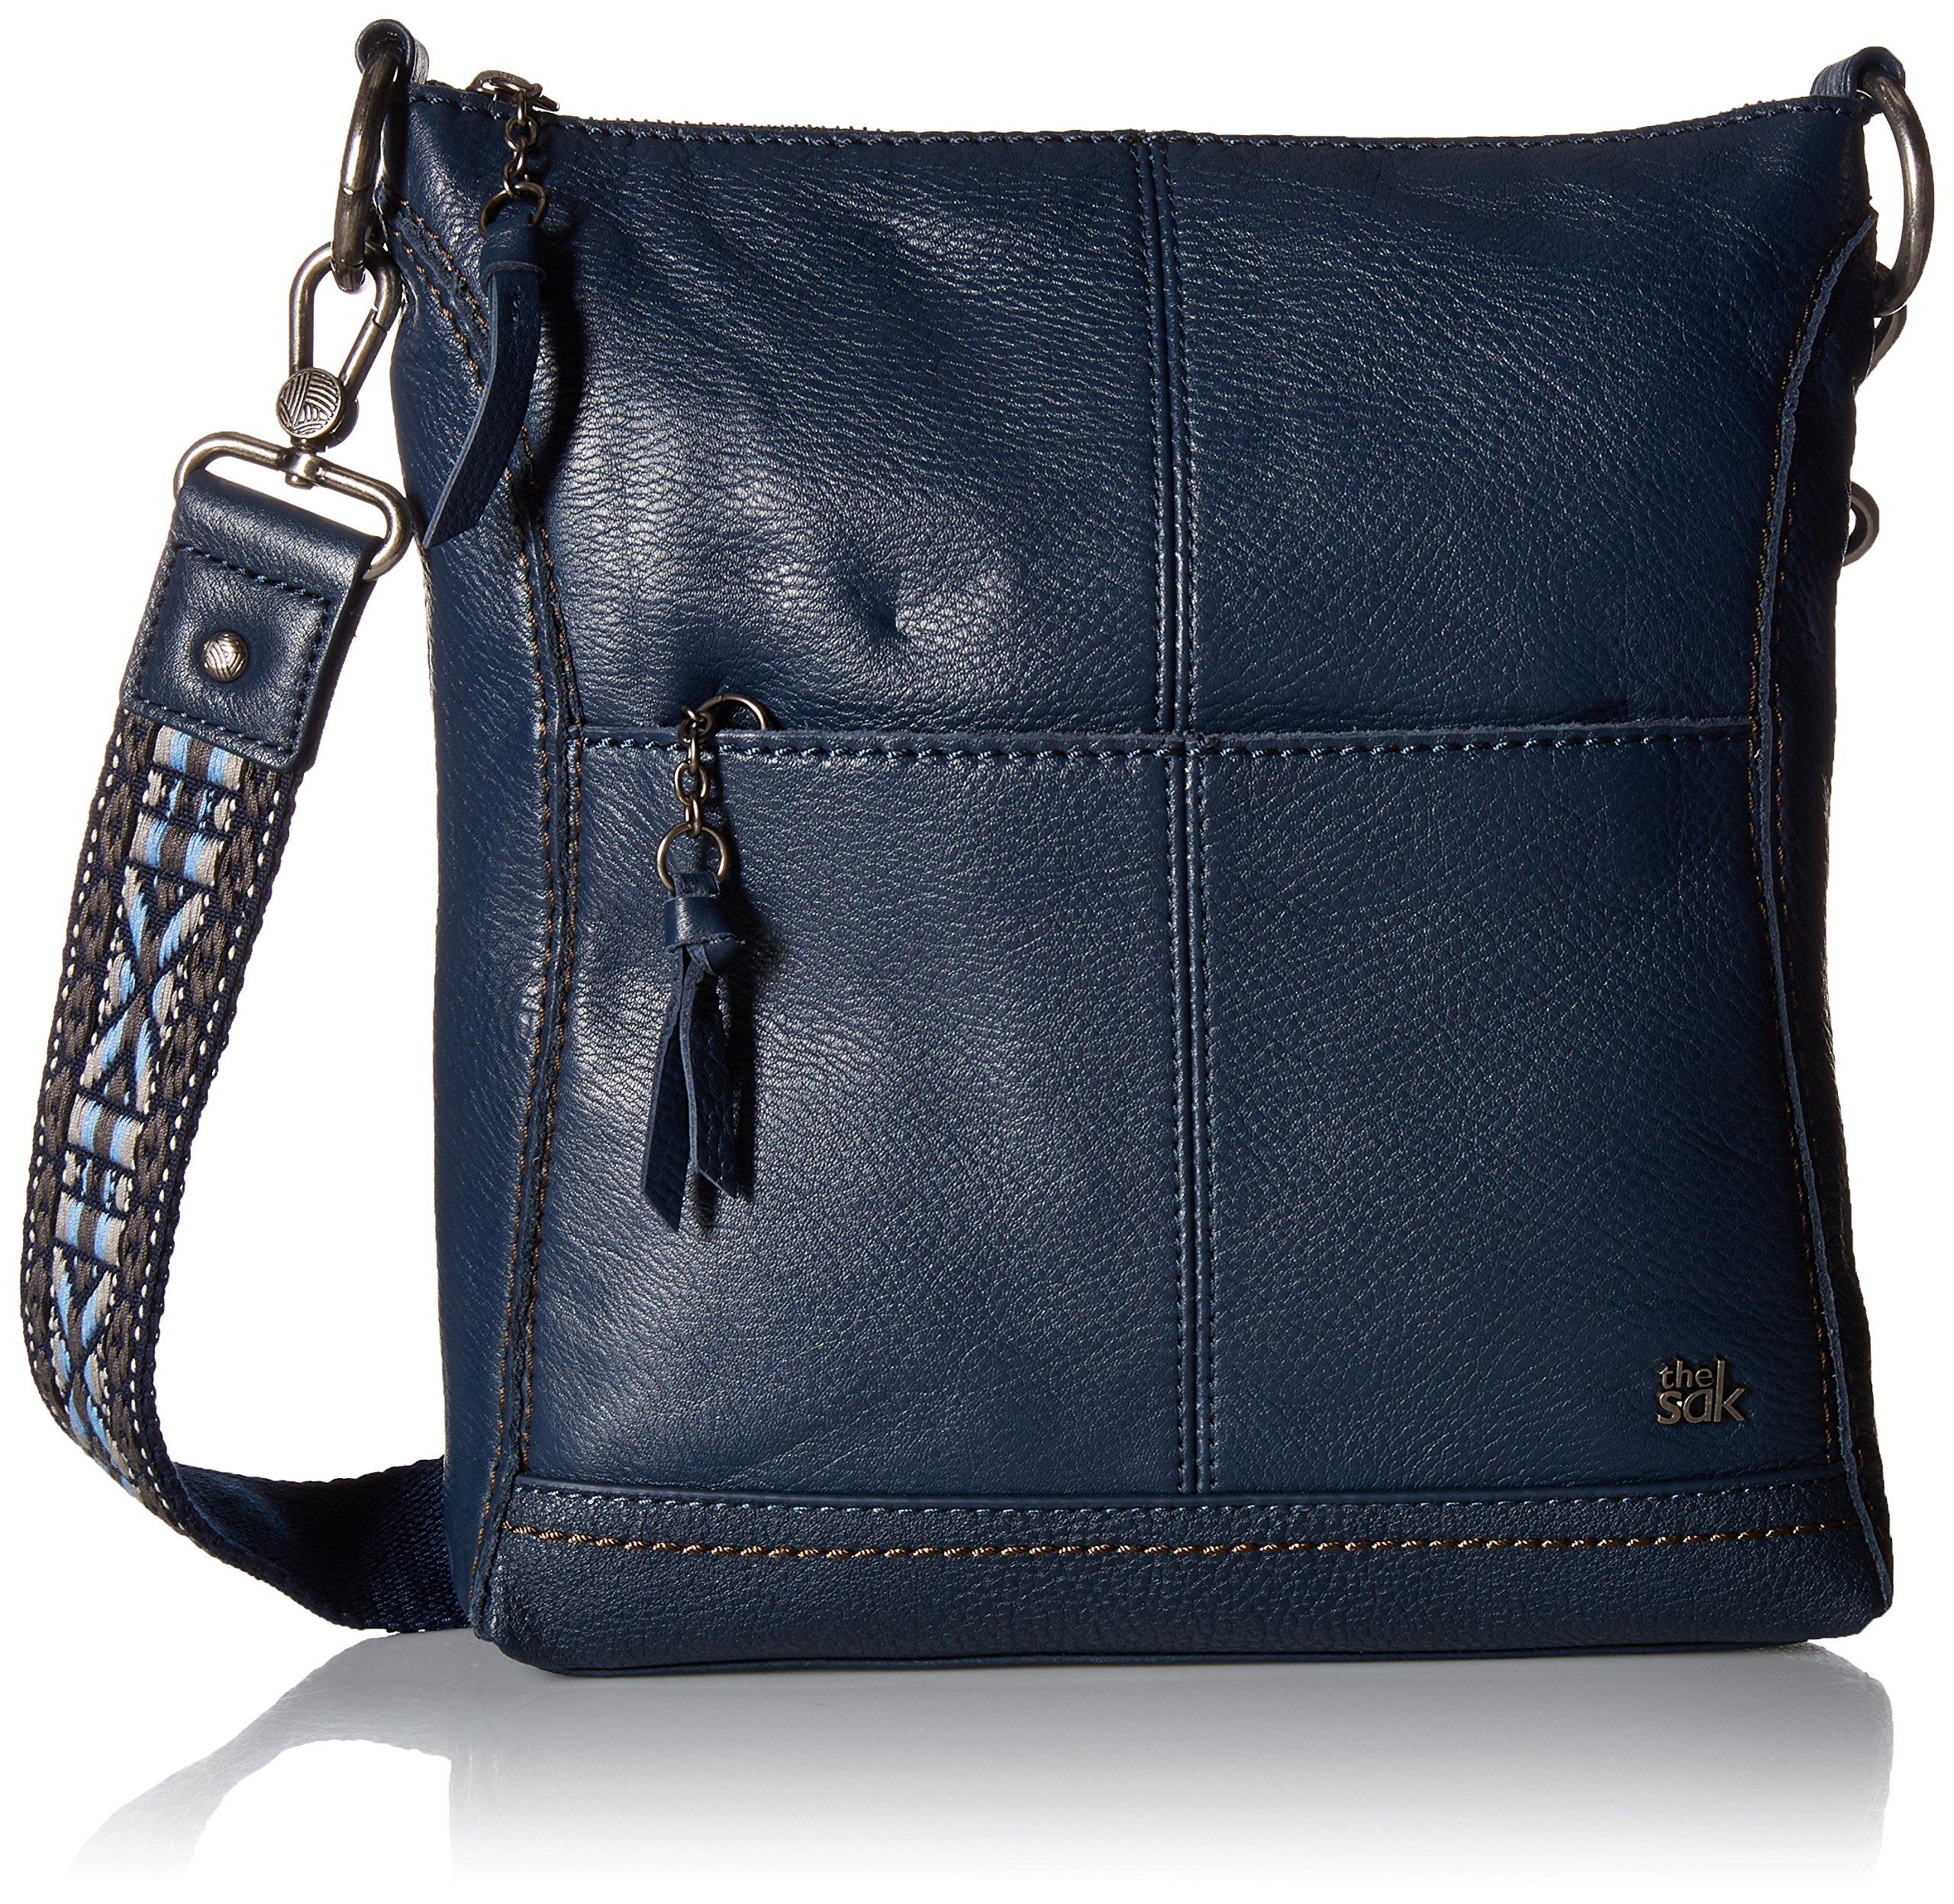 The Sak Women's Lucia Crossbody Indigo Crossbody Bag